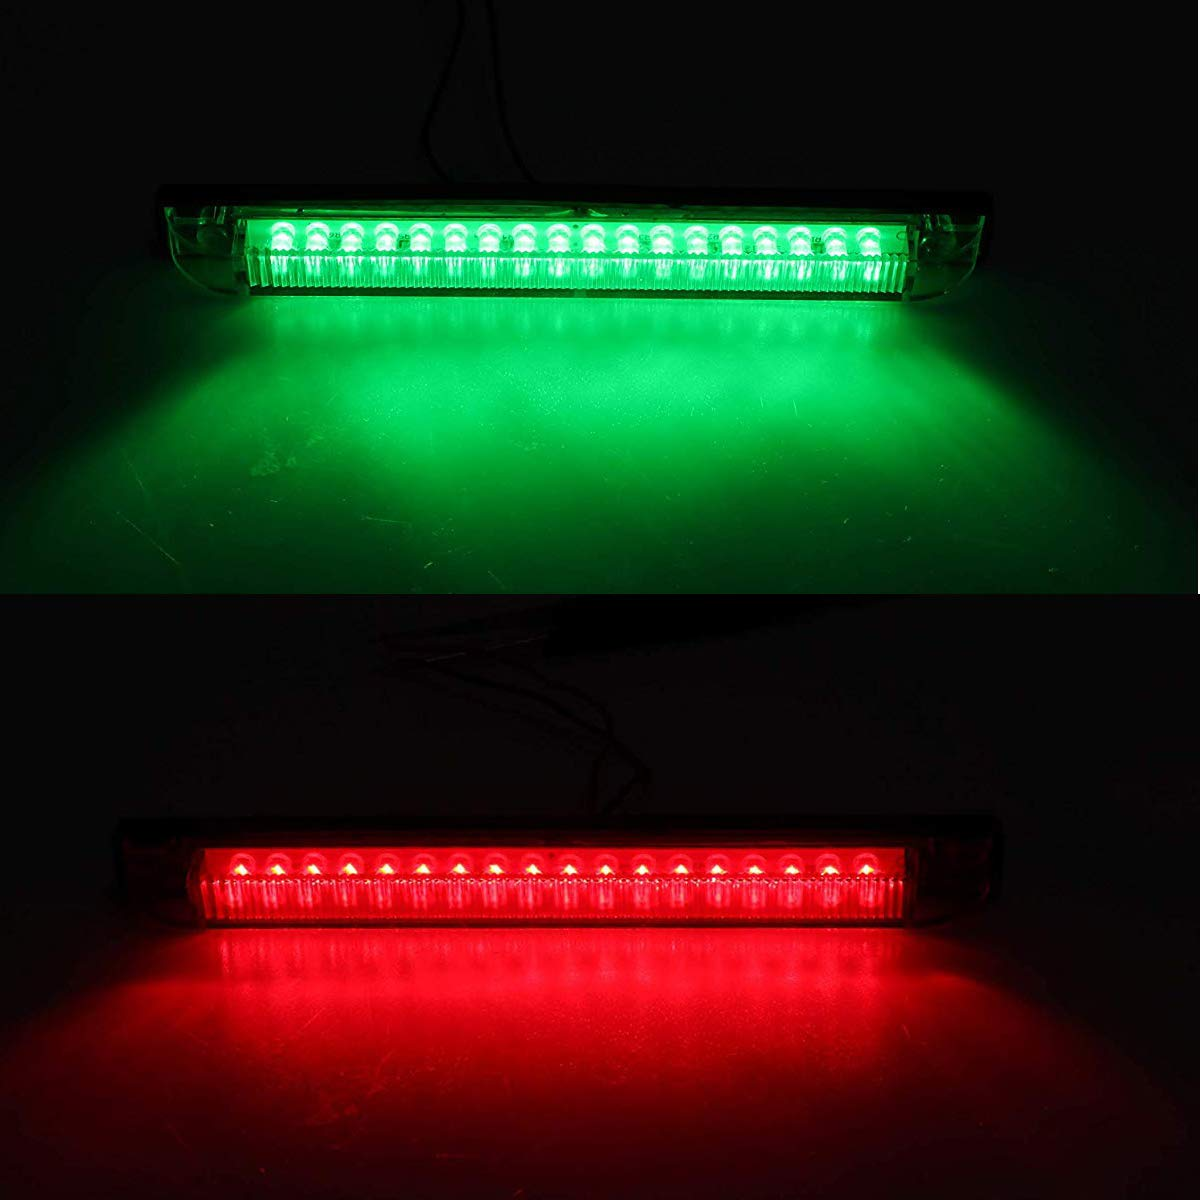 2Green + 2Red 4-Pack 8 Boat Bow Navigation Light 18 LED Red /& Green Marine Utility Strip Bar Waterproof Side Marker Lights for Boat RV Trailer